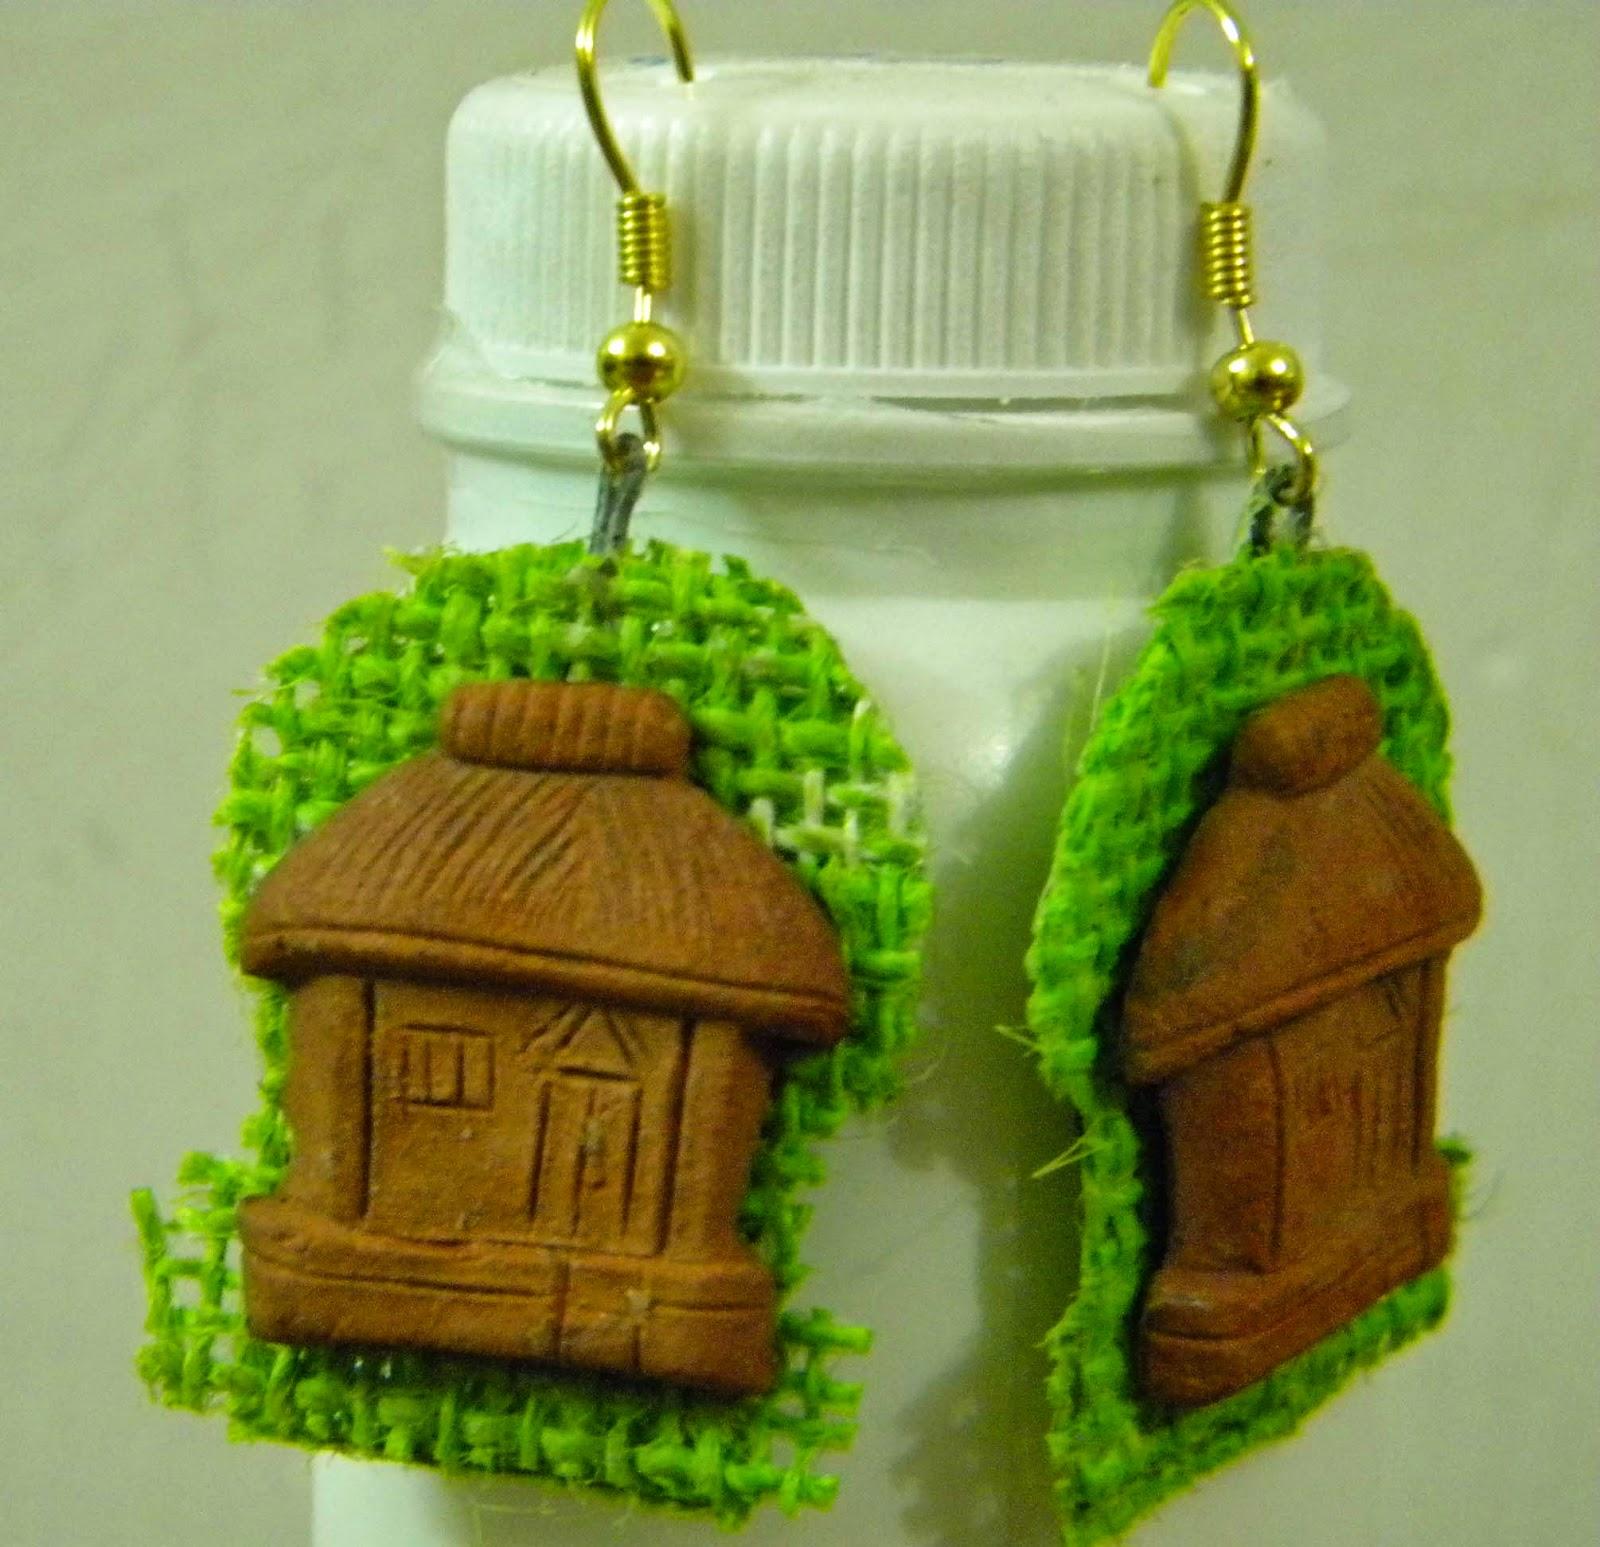 fashion jewellery, handmade earring, handmade jewellery, jute earring, jute jewellery, terracotta earring, trendy earring,